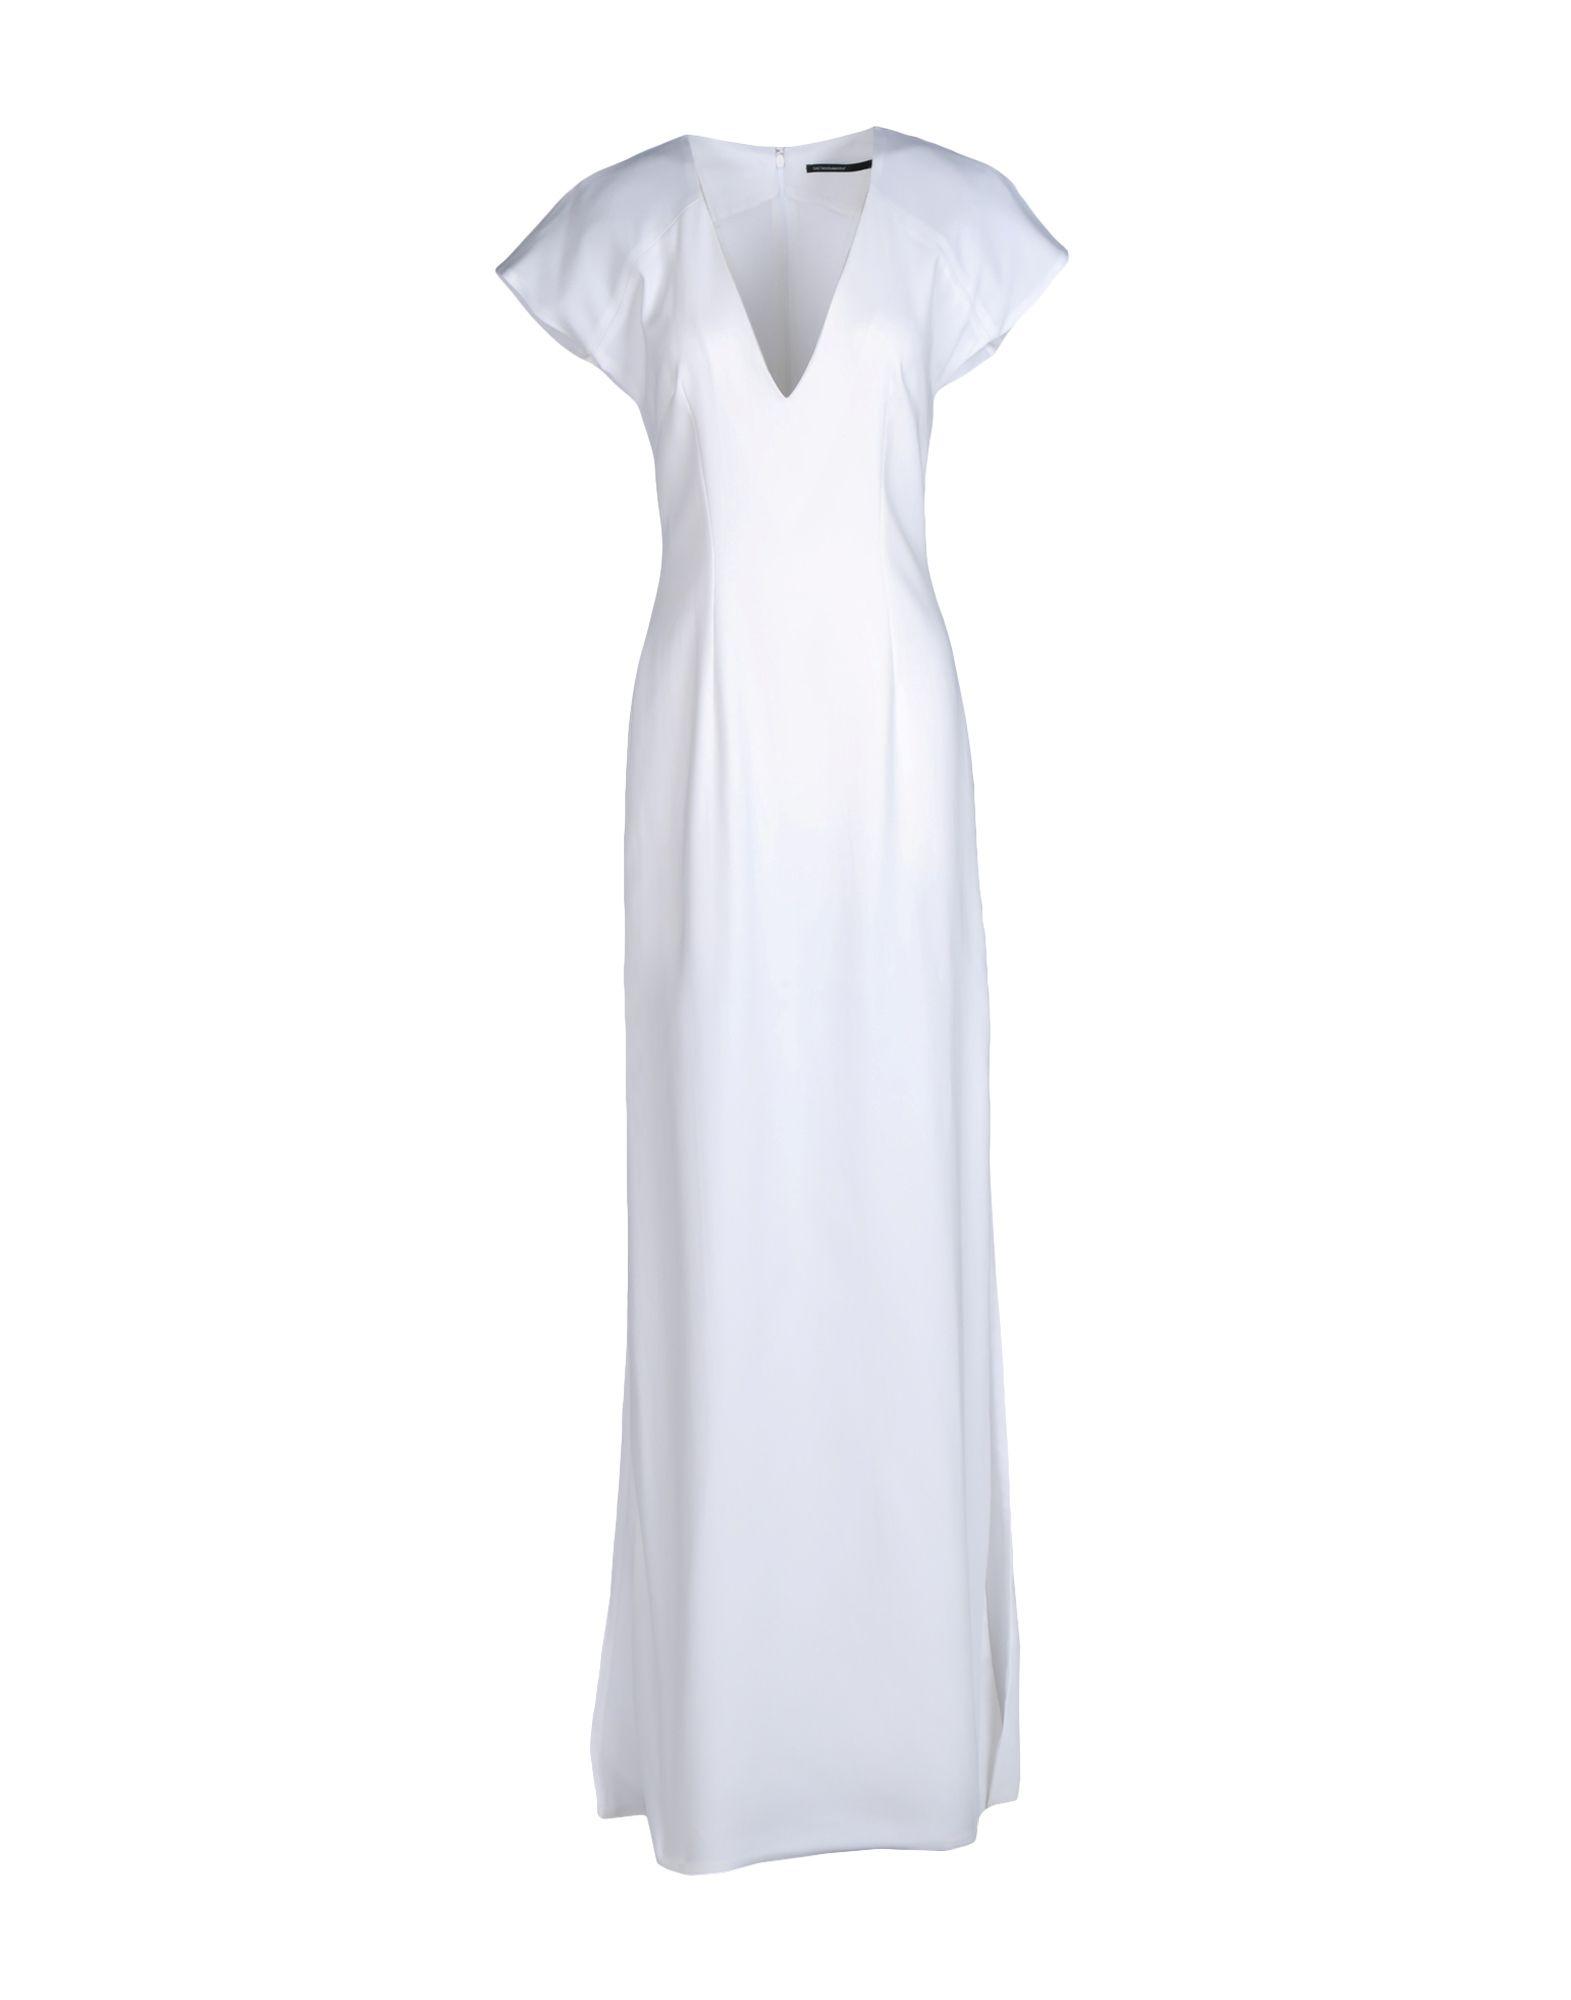 GAETANO NAVARRA Короткое платье gaetano navarra футболка с короткими рукавами